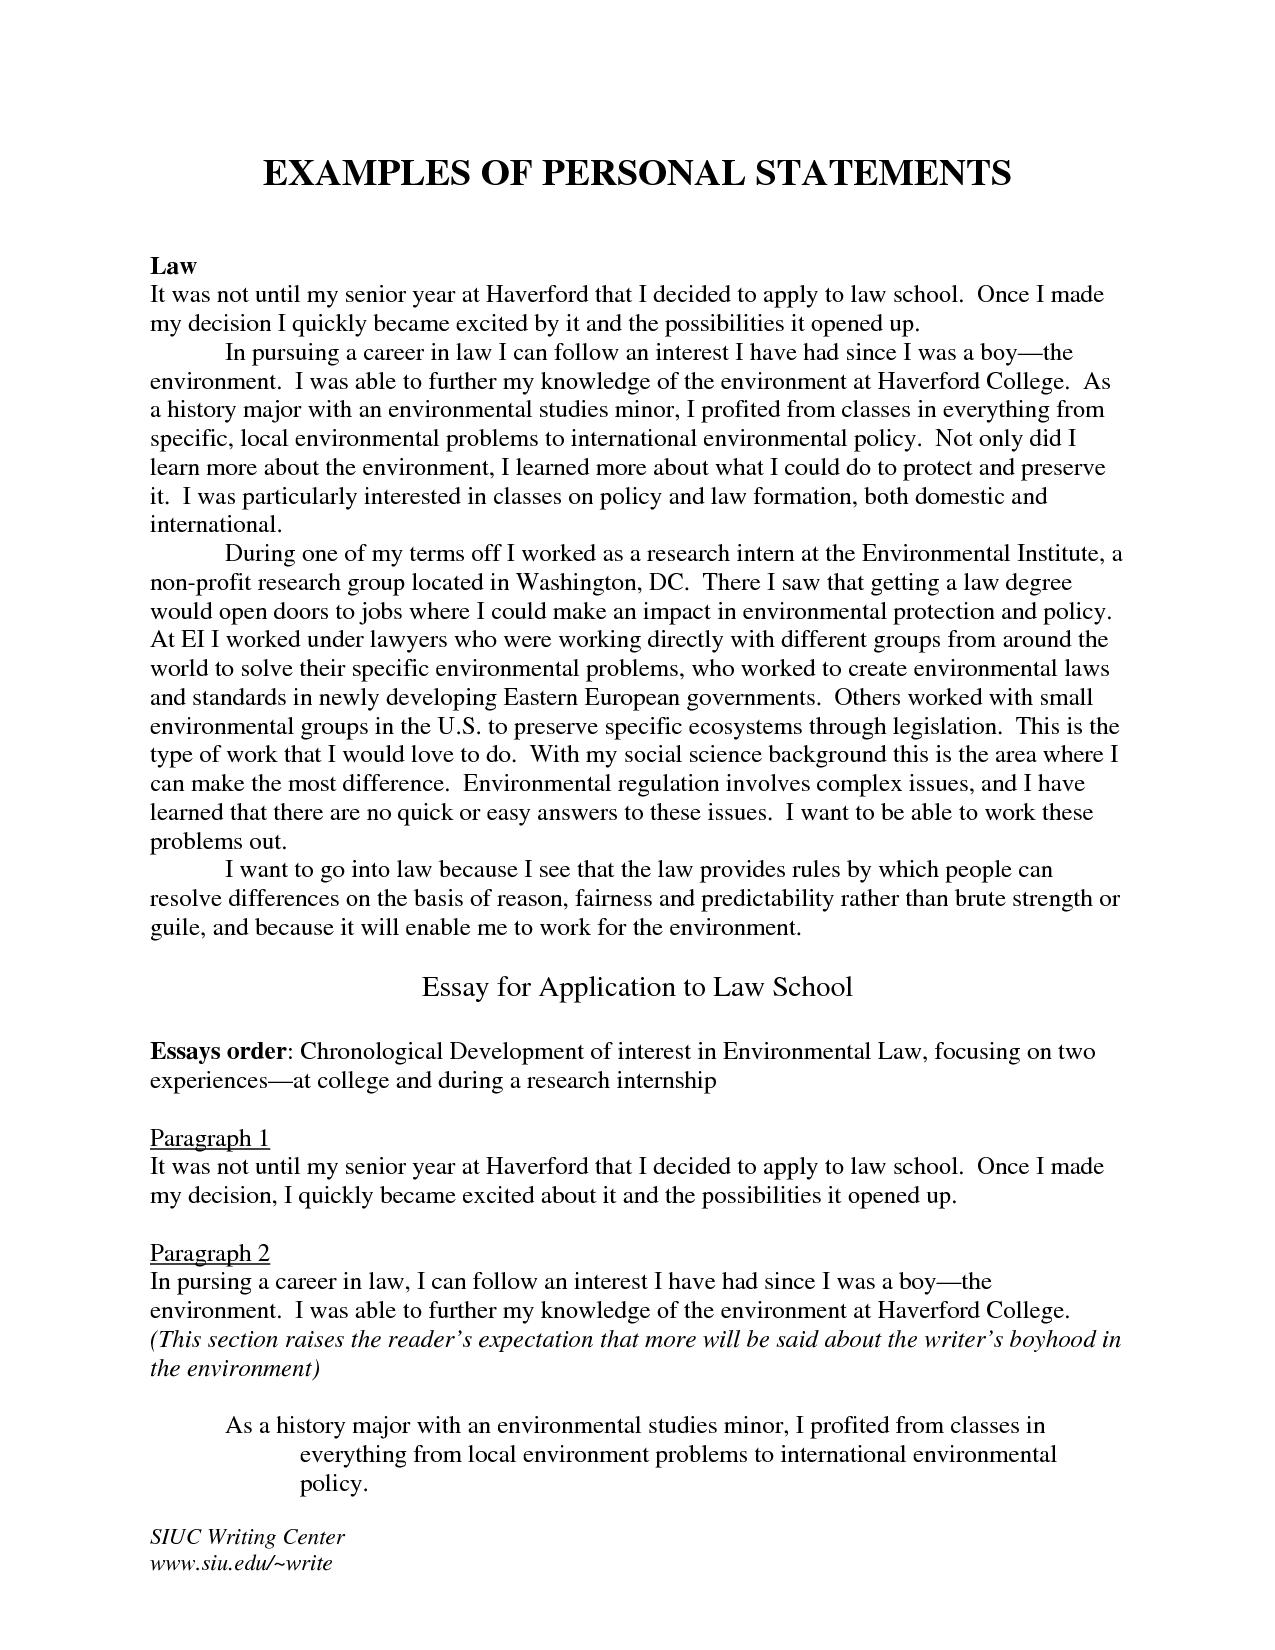 013 Statement Of Purpose Sample Essays Essay Fearsome Nursing Graduate School Education Mba Full